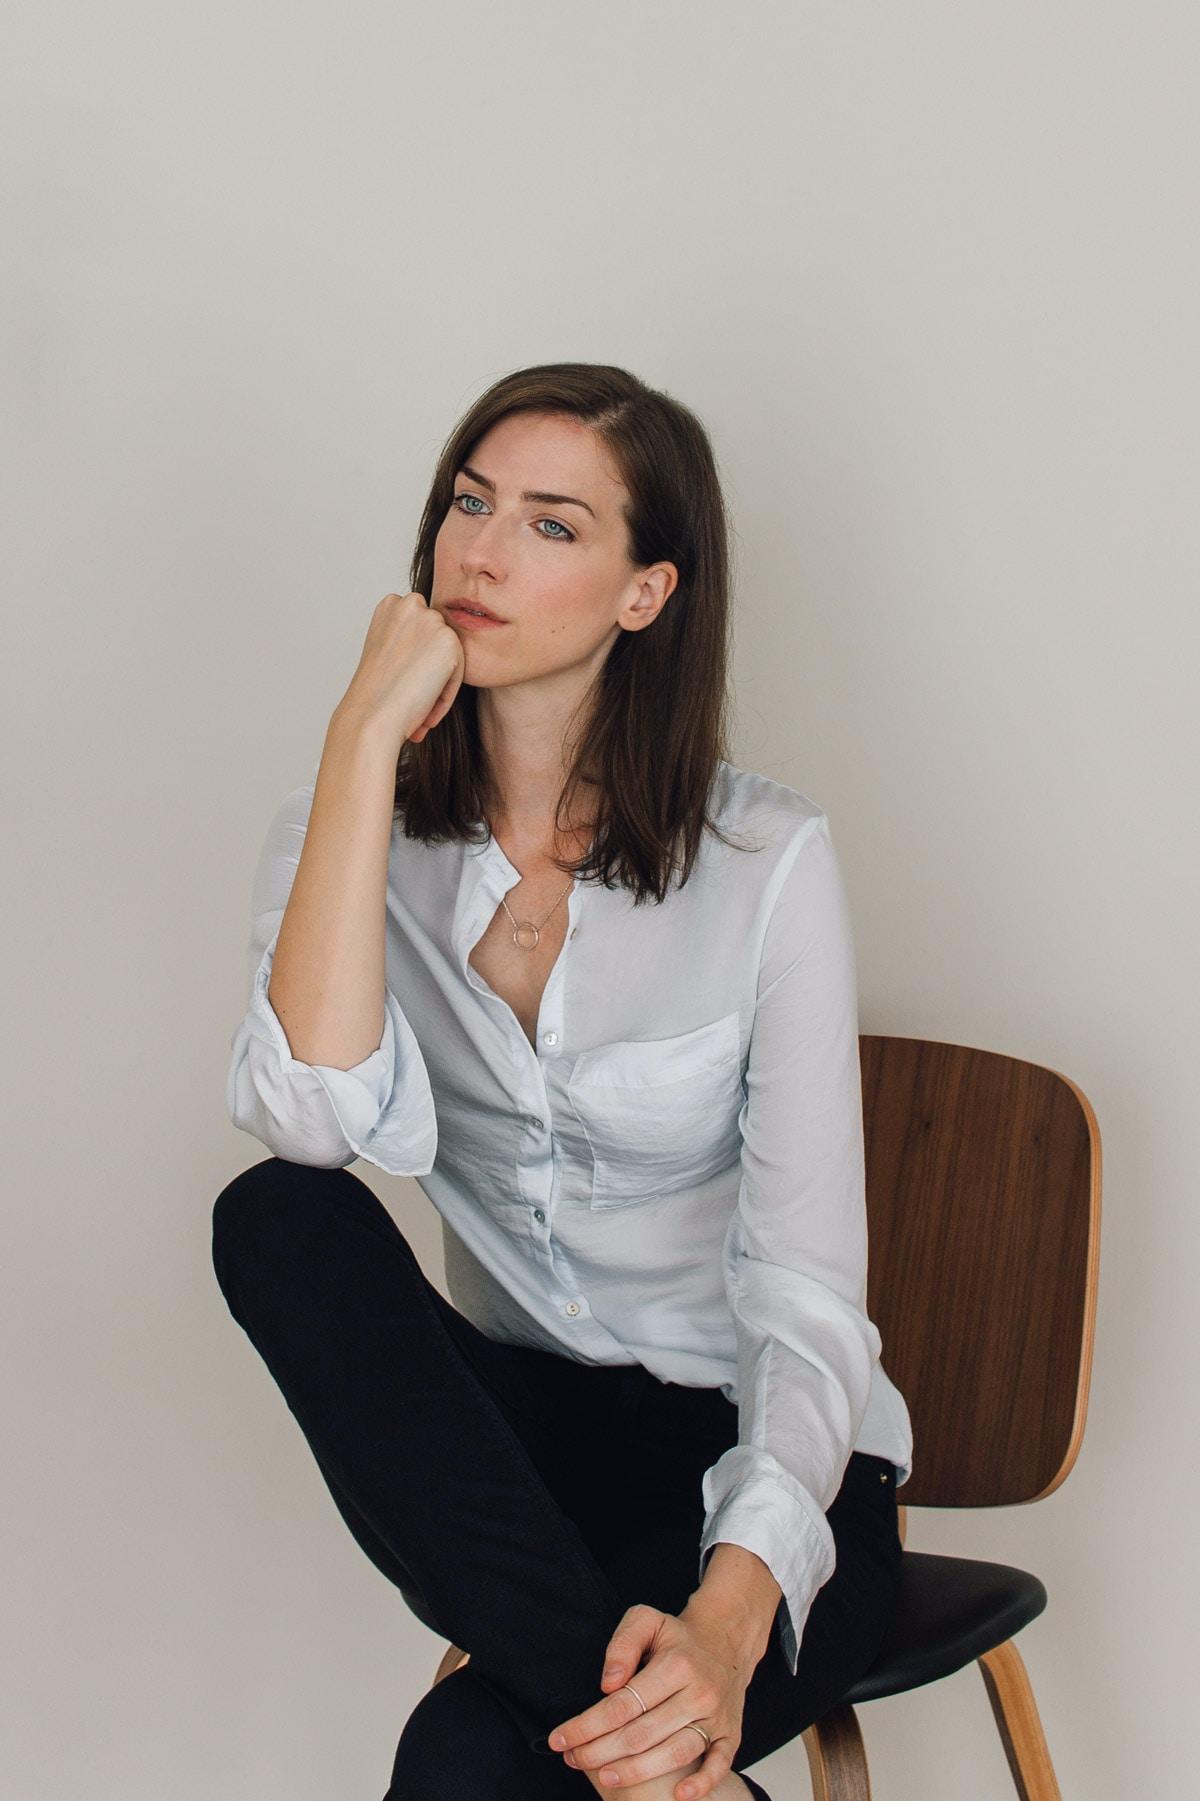 Sarah Dorweiler